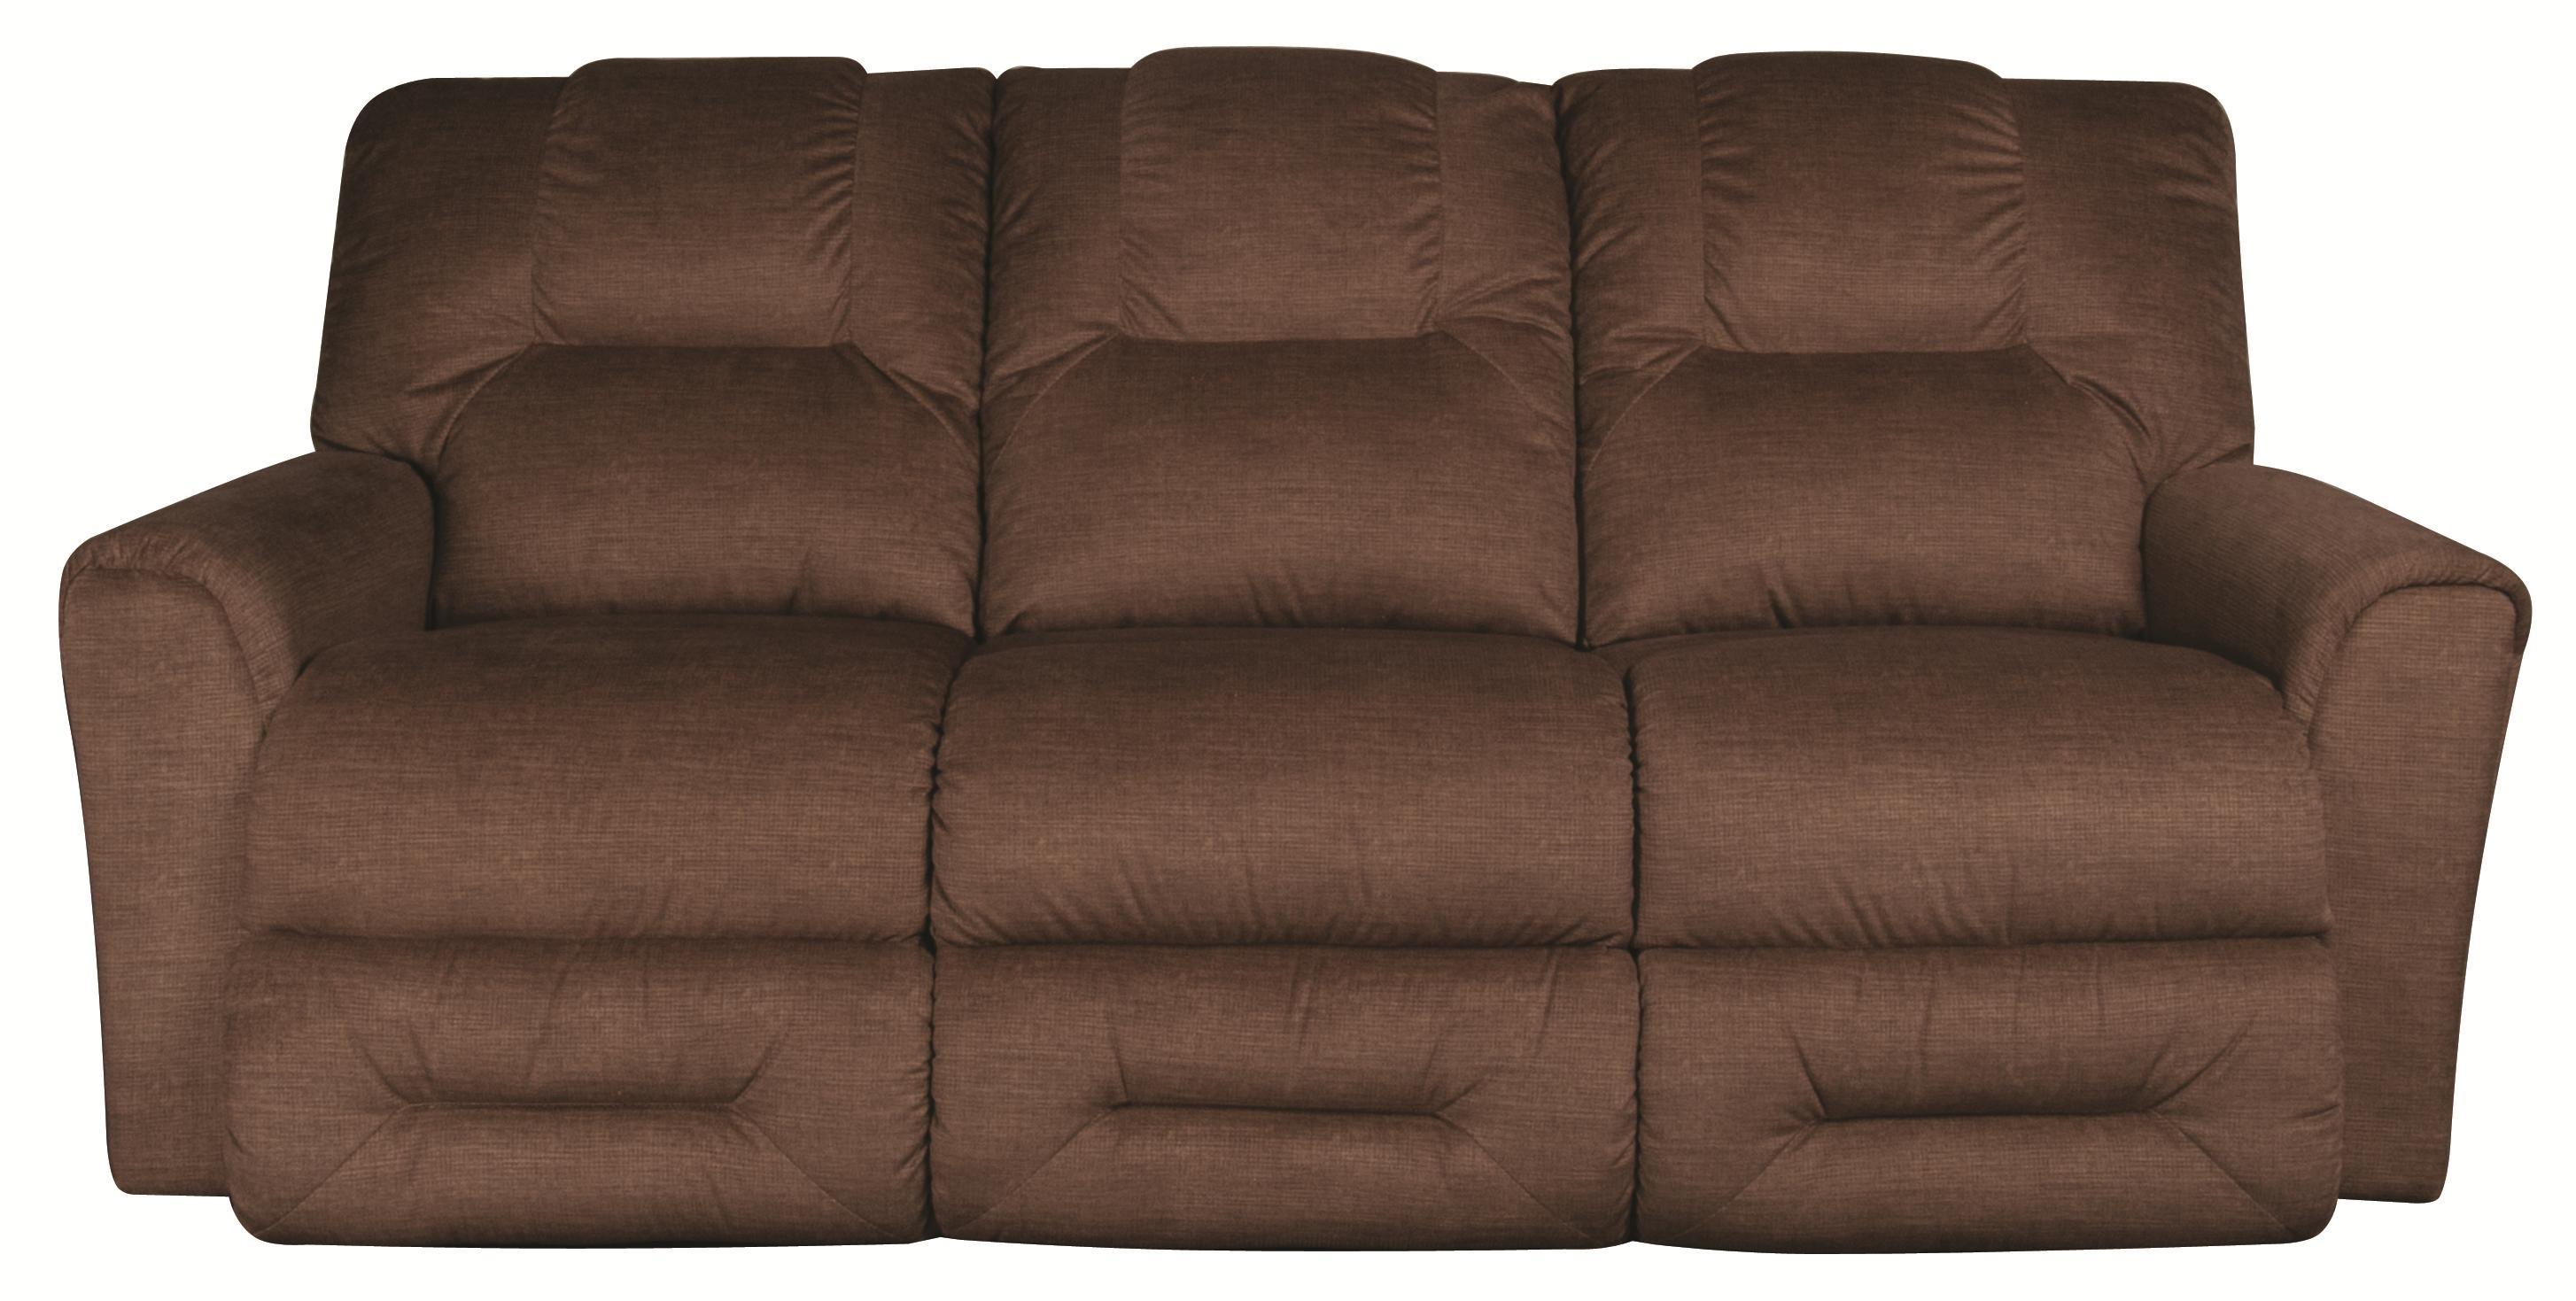 La-Z-Boy Easton Easton Power Reclining Sofa - Item Number: 102810024